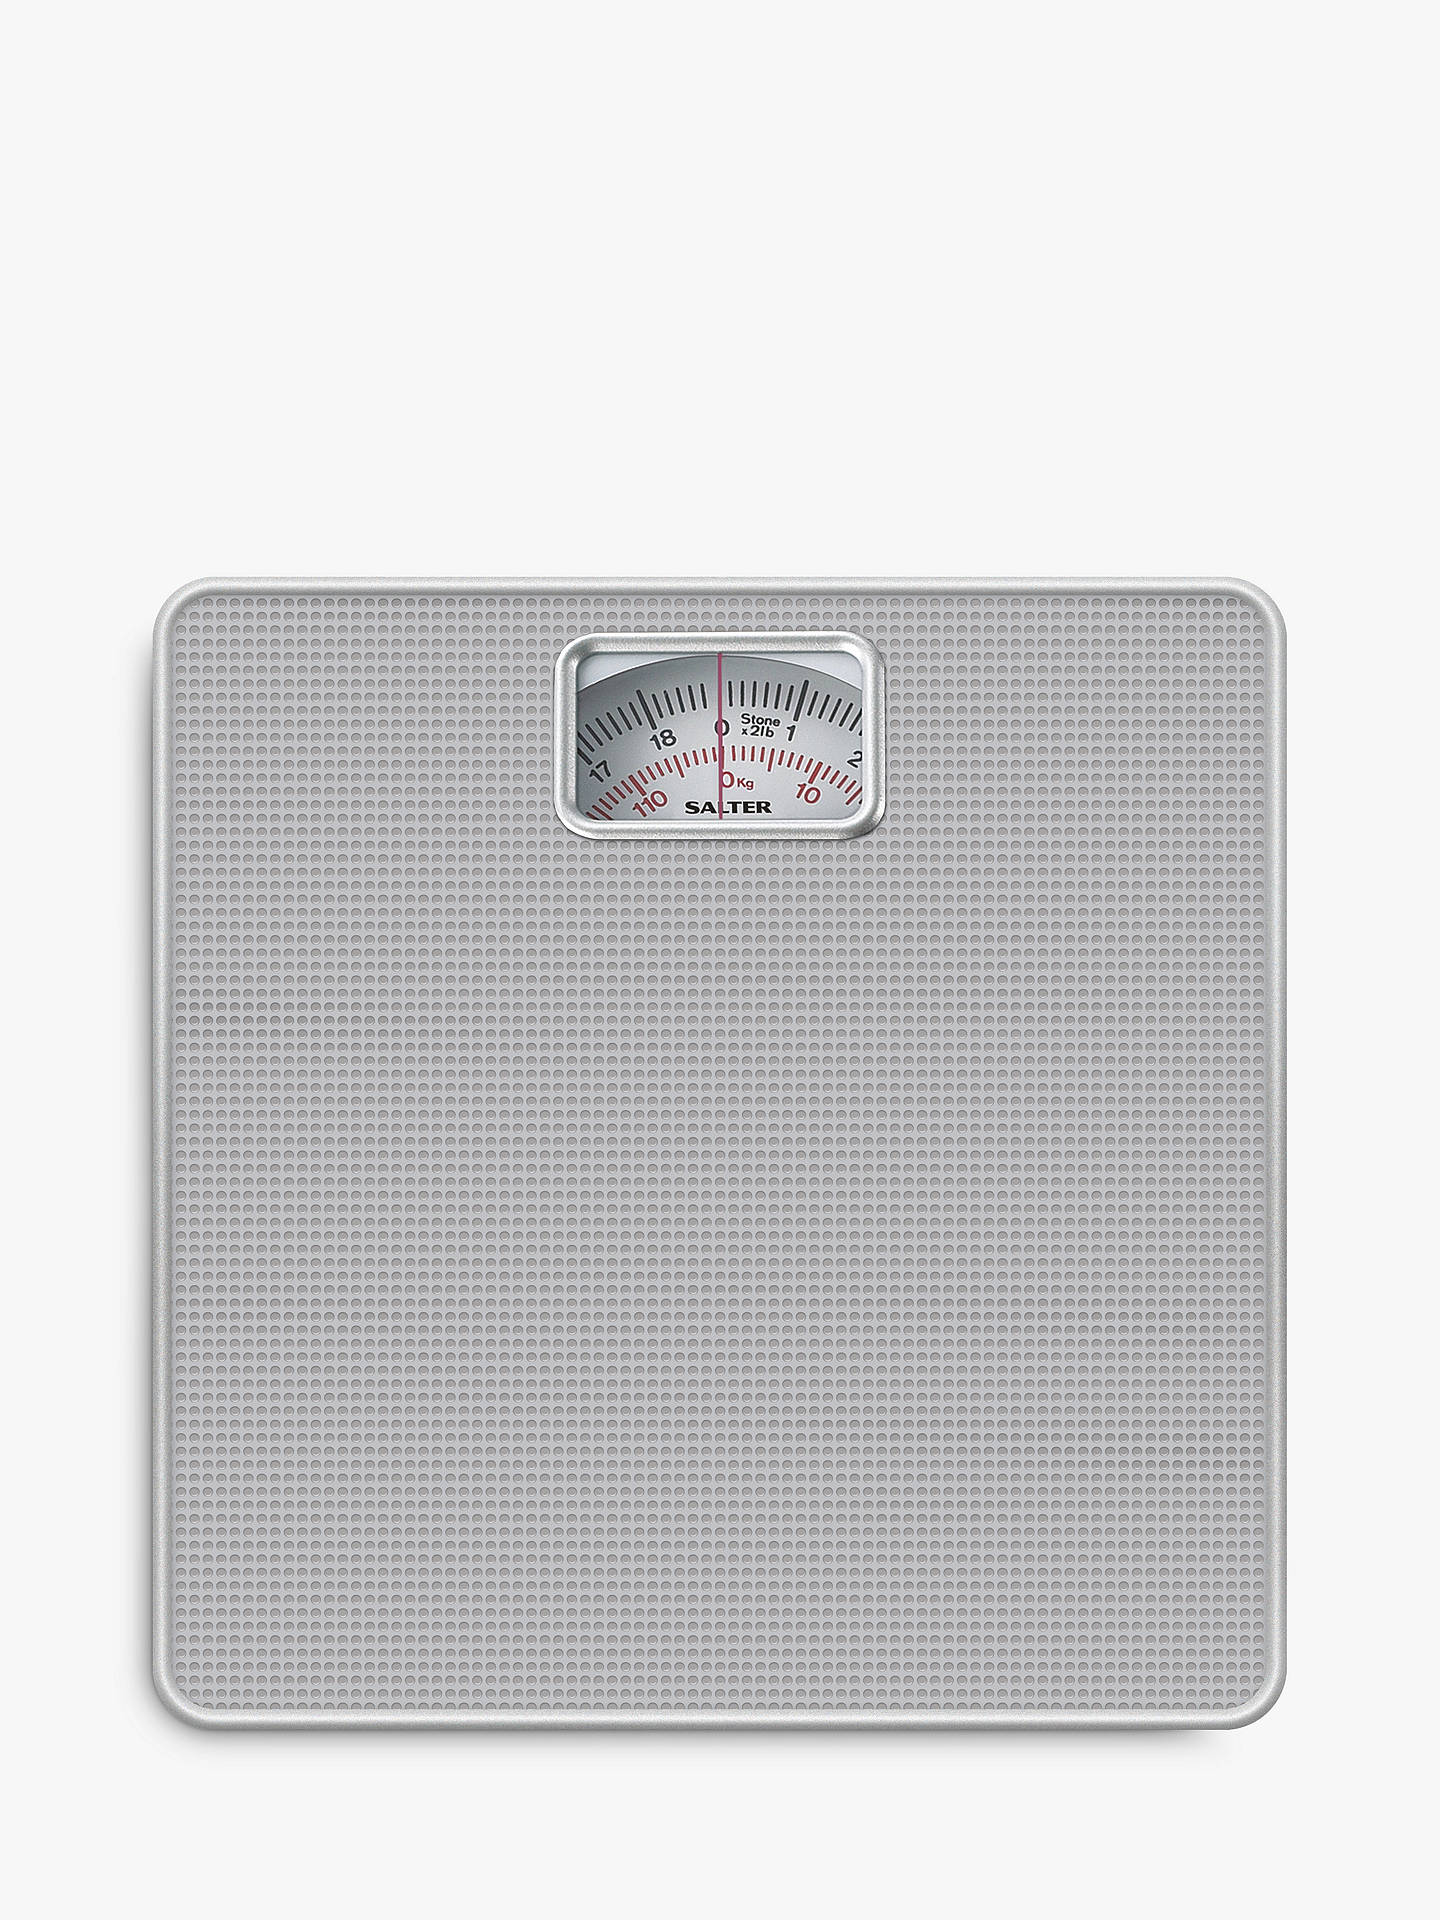 BuySalter 433 Mechanical Bathroom Scale Online At Johnlewis.com ...